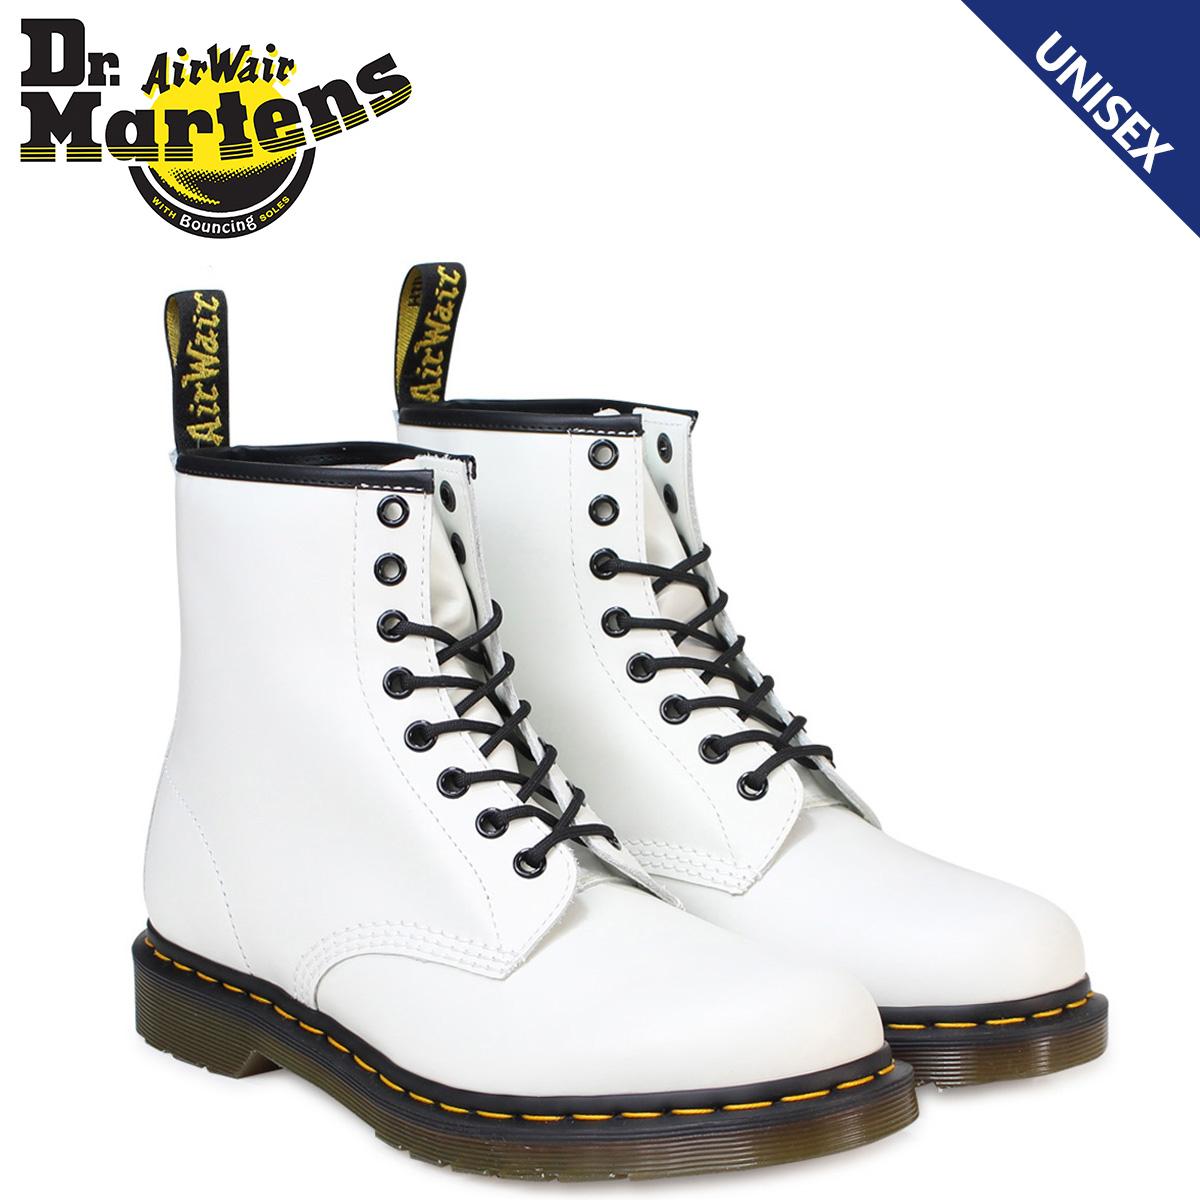 Dr.Martens ドクターマーチン 1460 8ホール ブーツ 8EYE BOOT R11822100 メンズ レディース